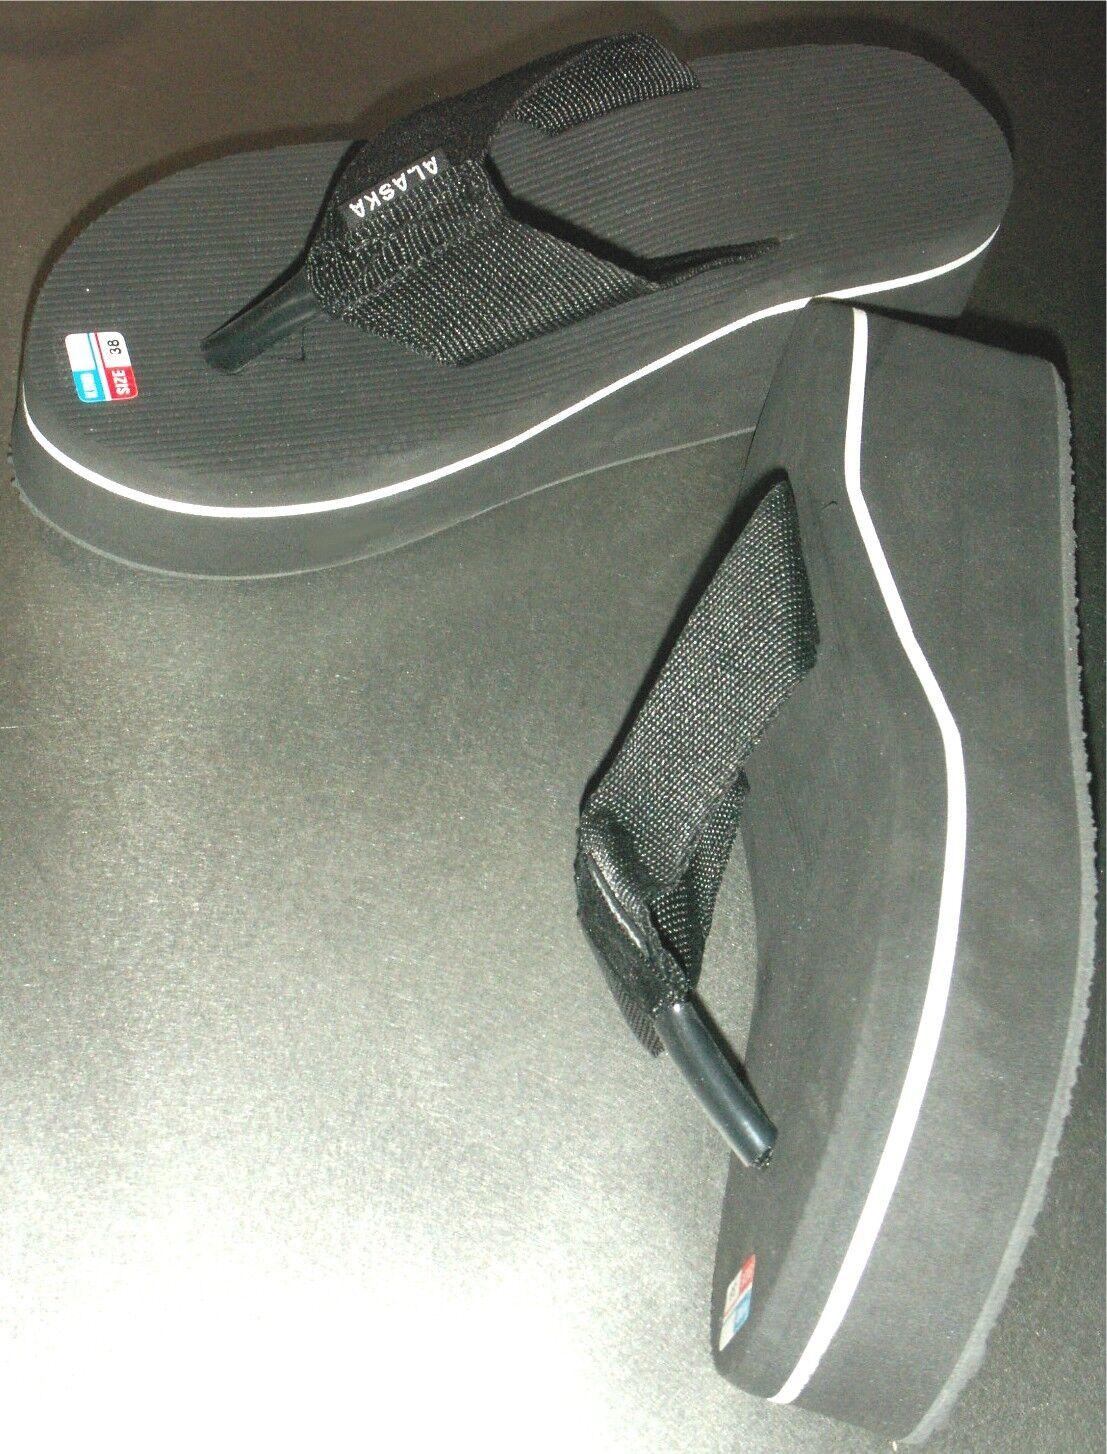 Platform Sandals Strappy Sandals Mules 36 37 38 39 40 41 42 New